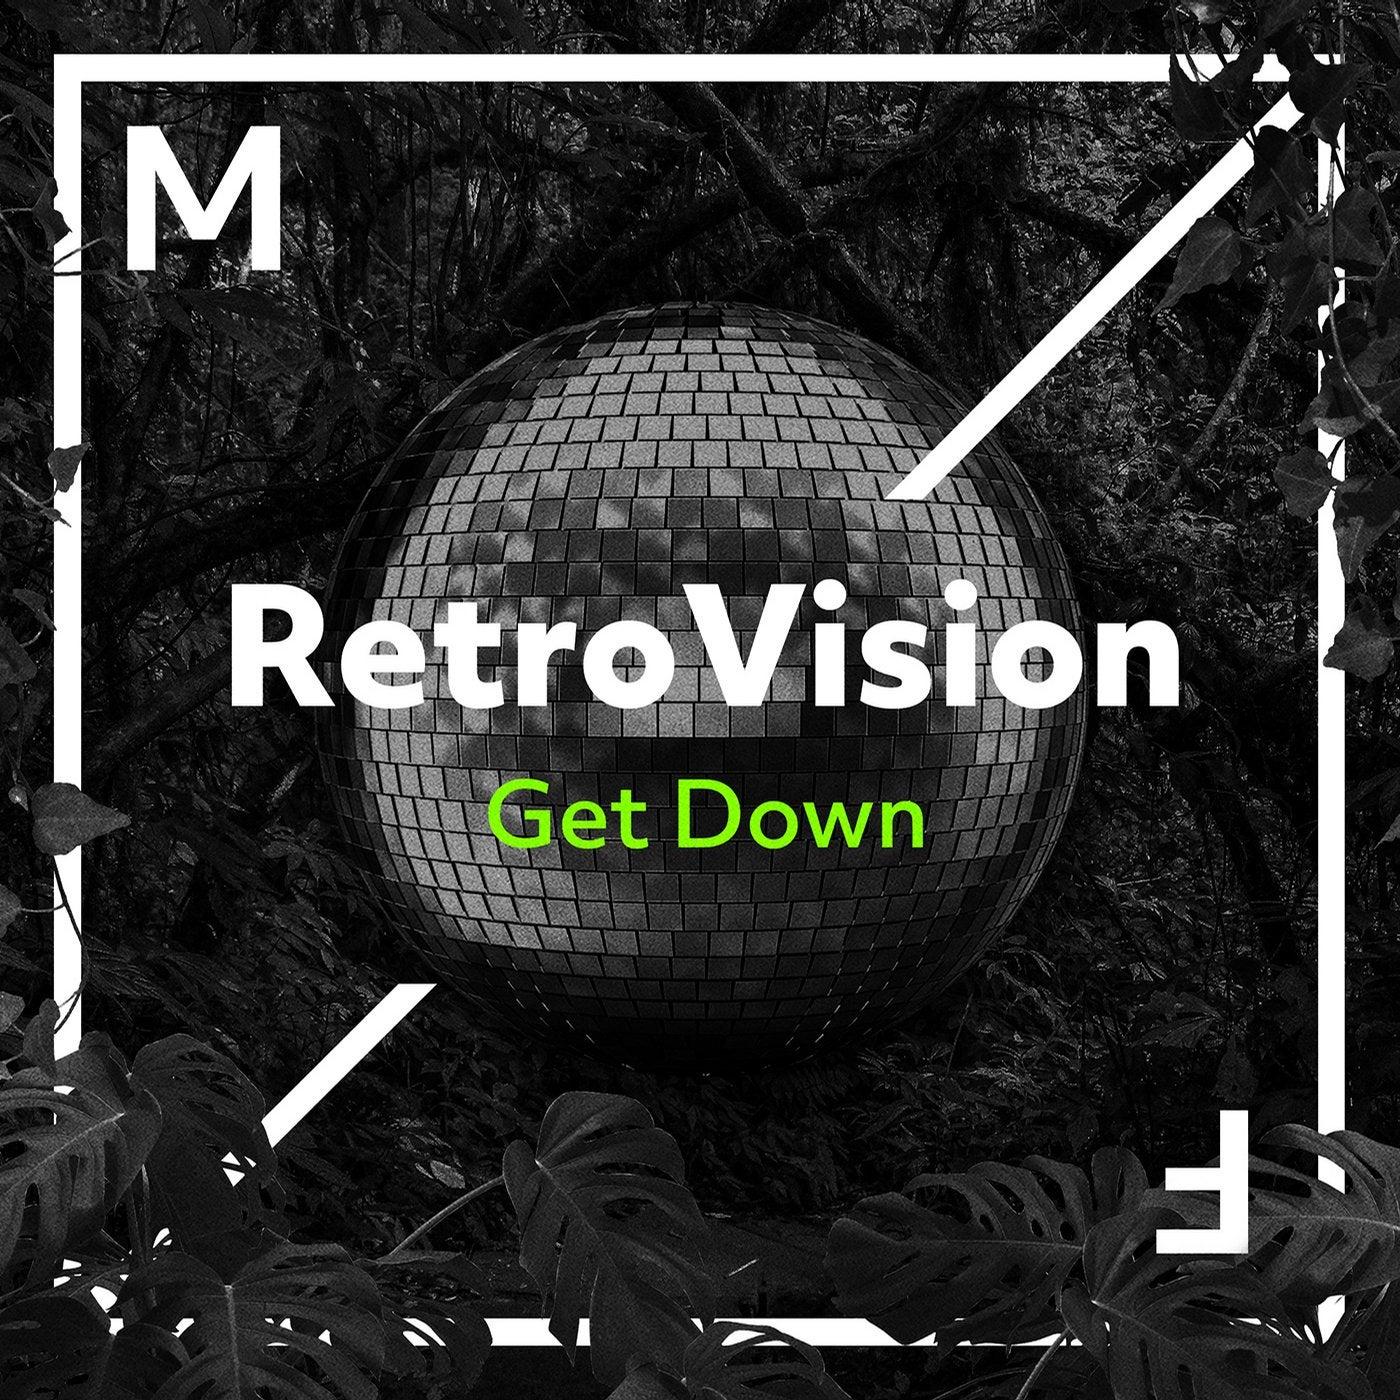 Get Down (Original Mix)